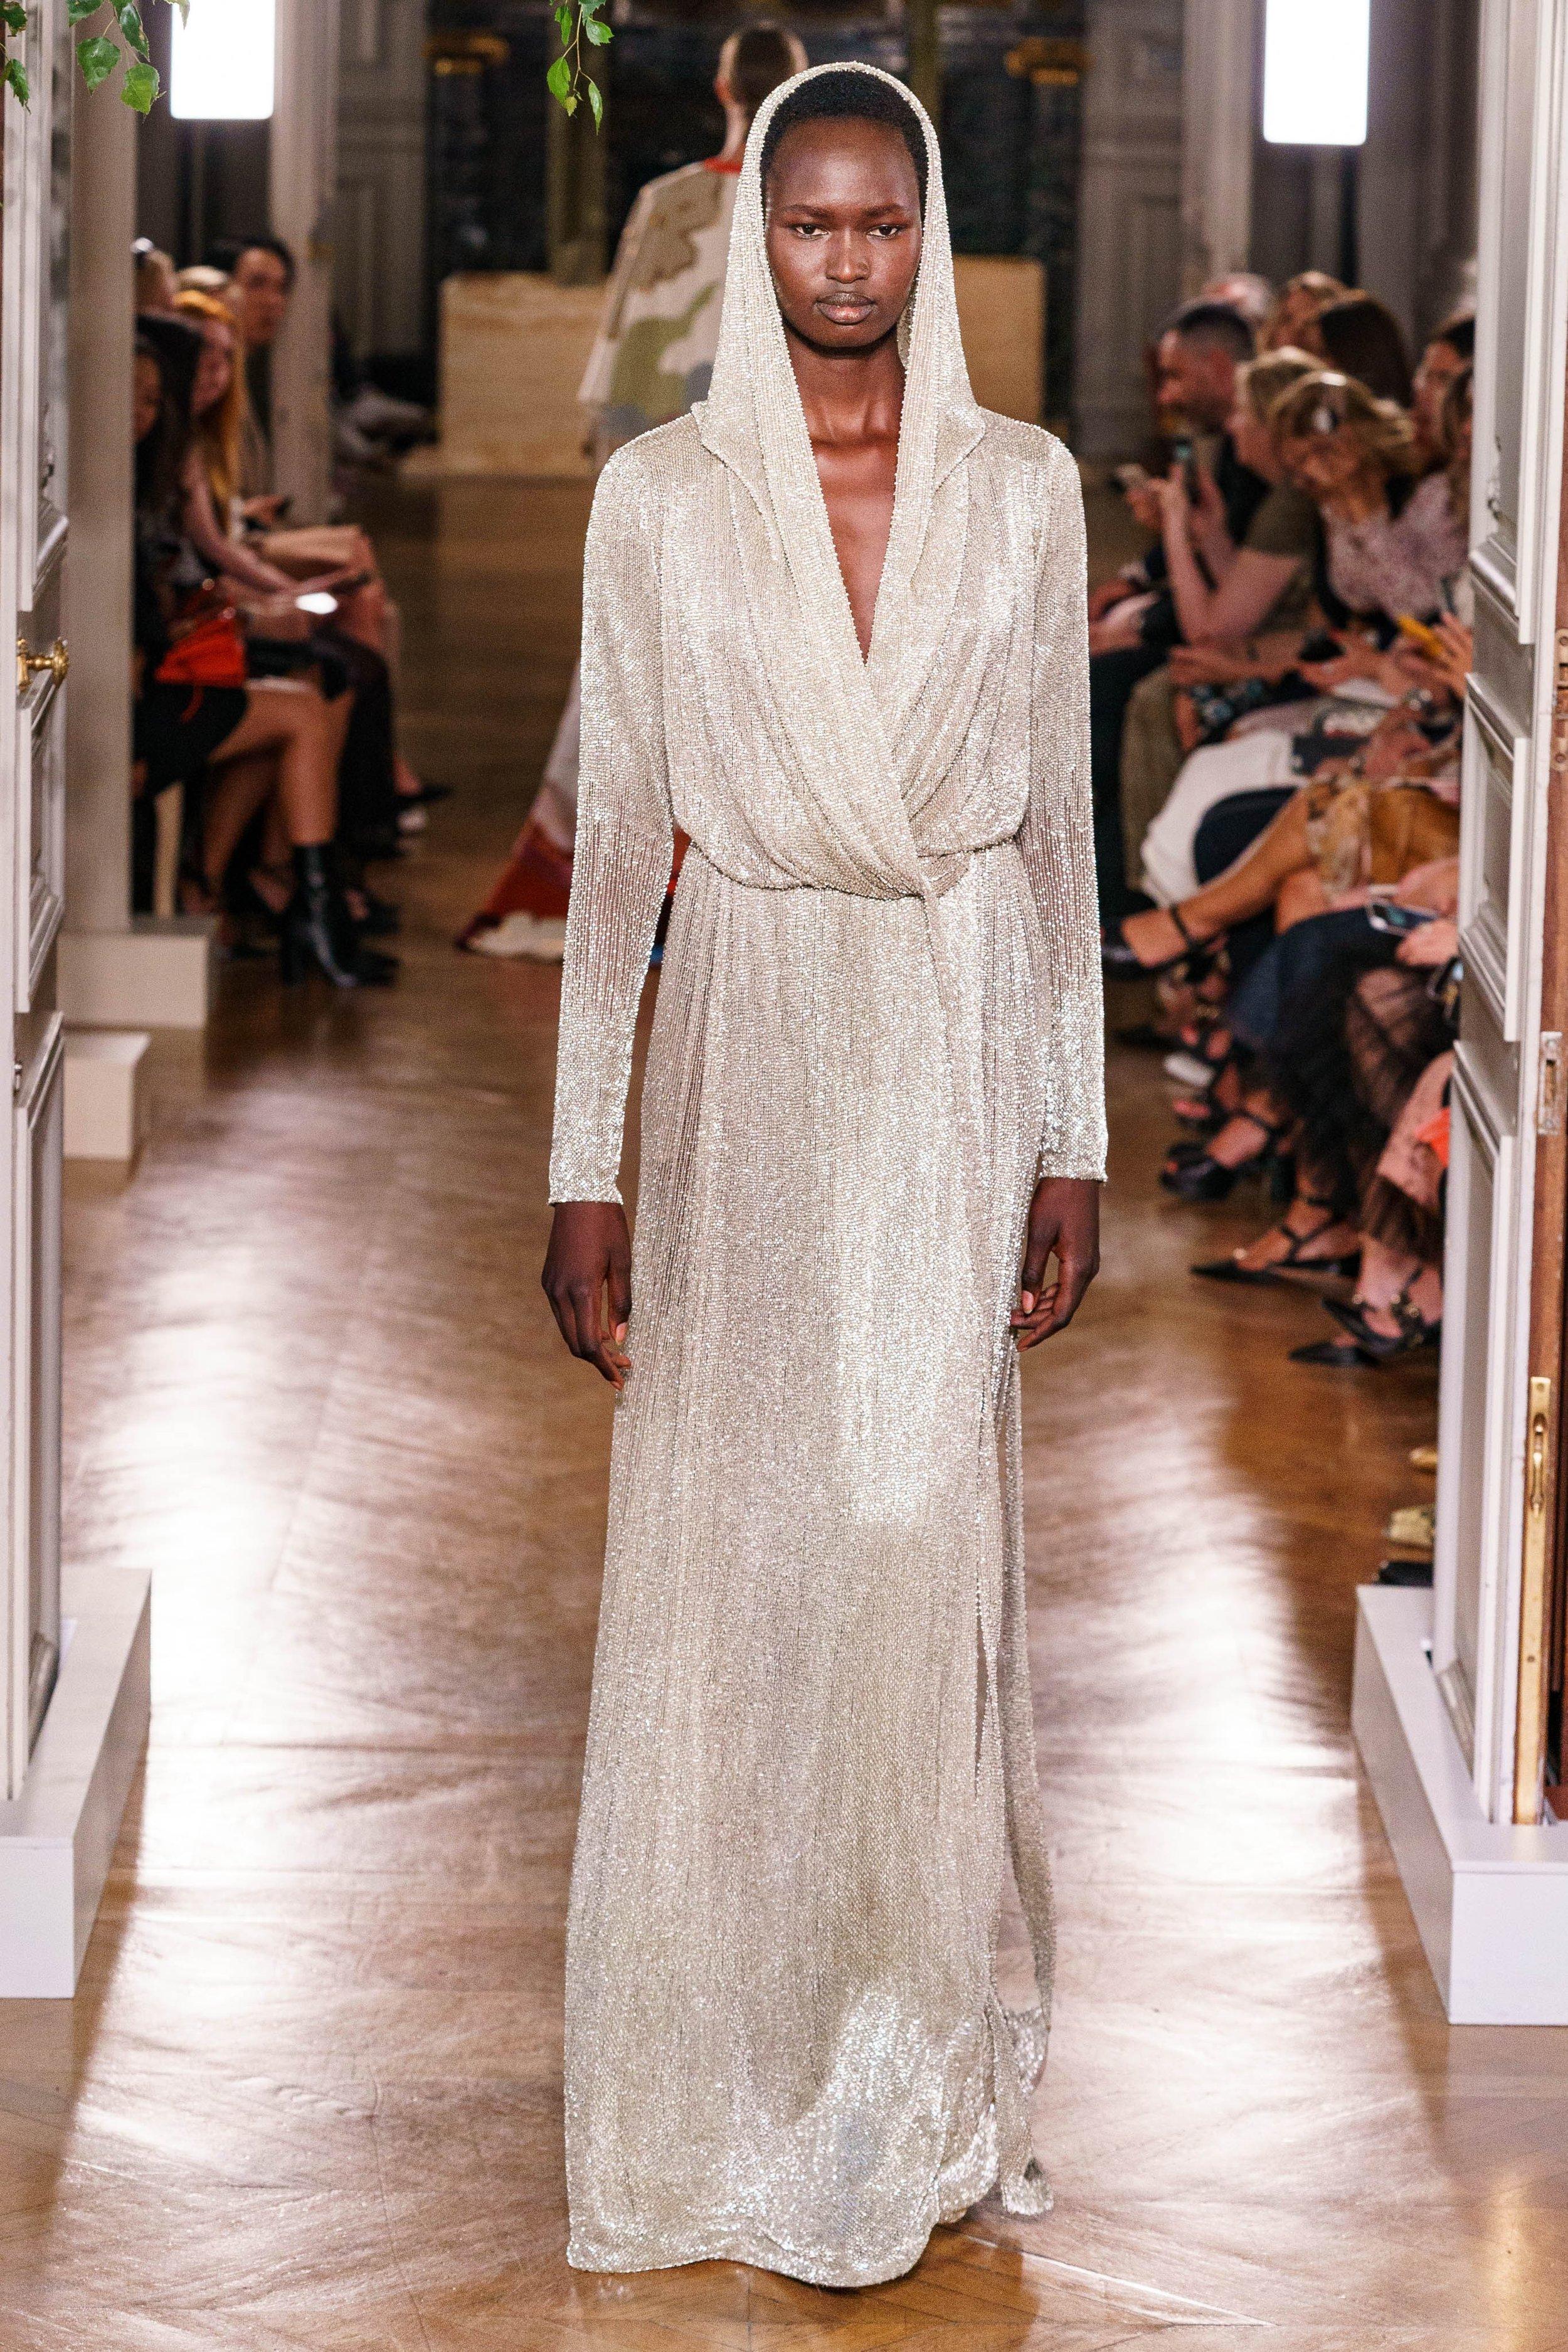 Nyarach Avouch Ayuel walking for Valentino Fall 2019 Couture. Photo: Alessandro Lucioni / Gorunway.com